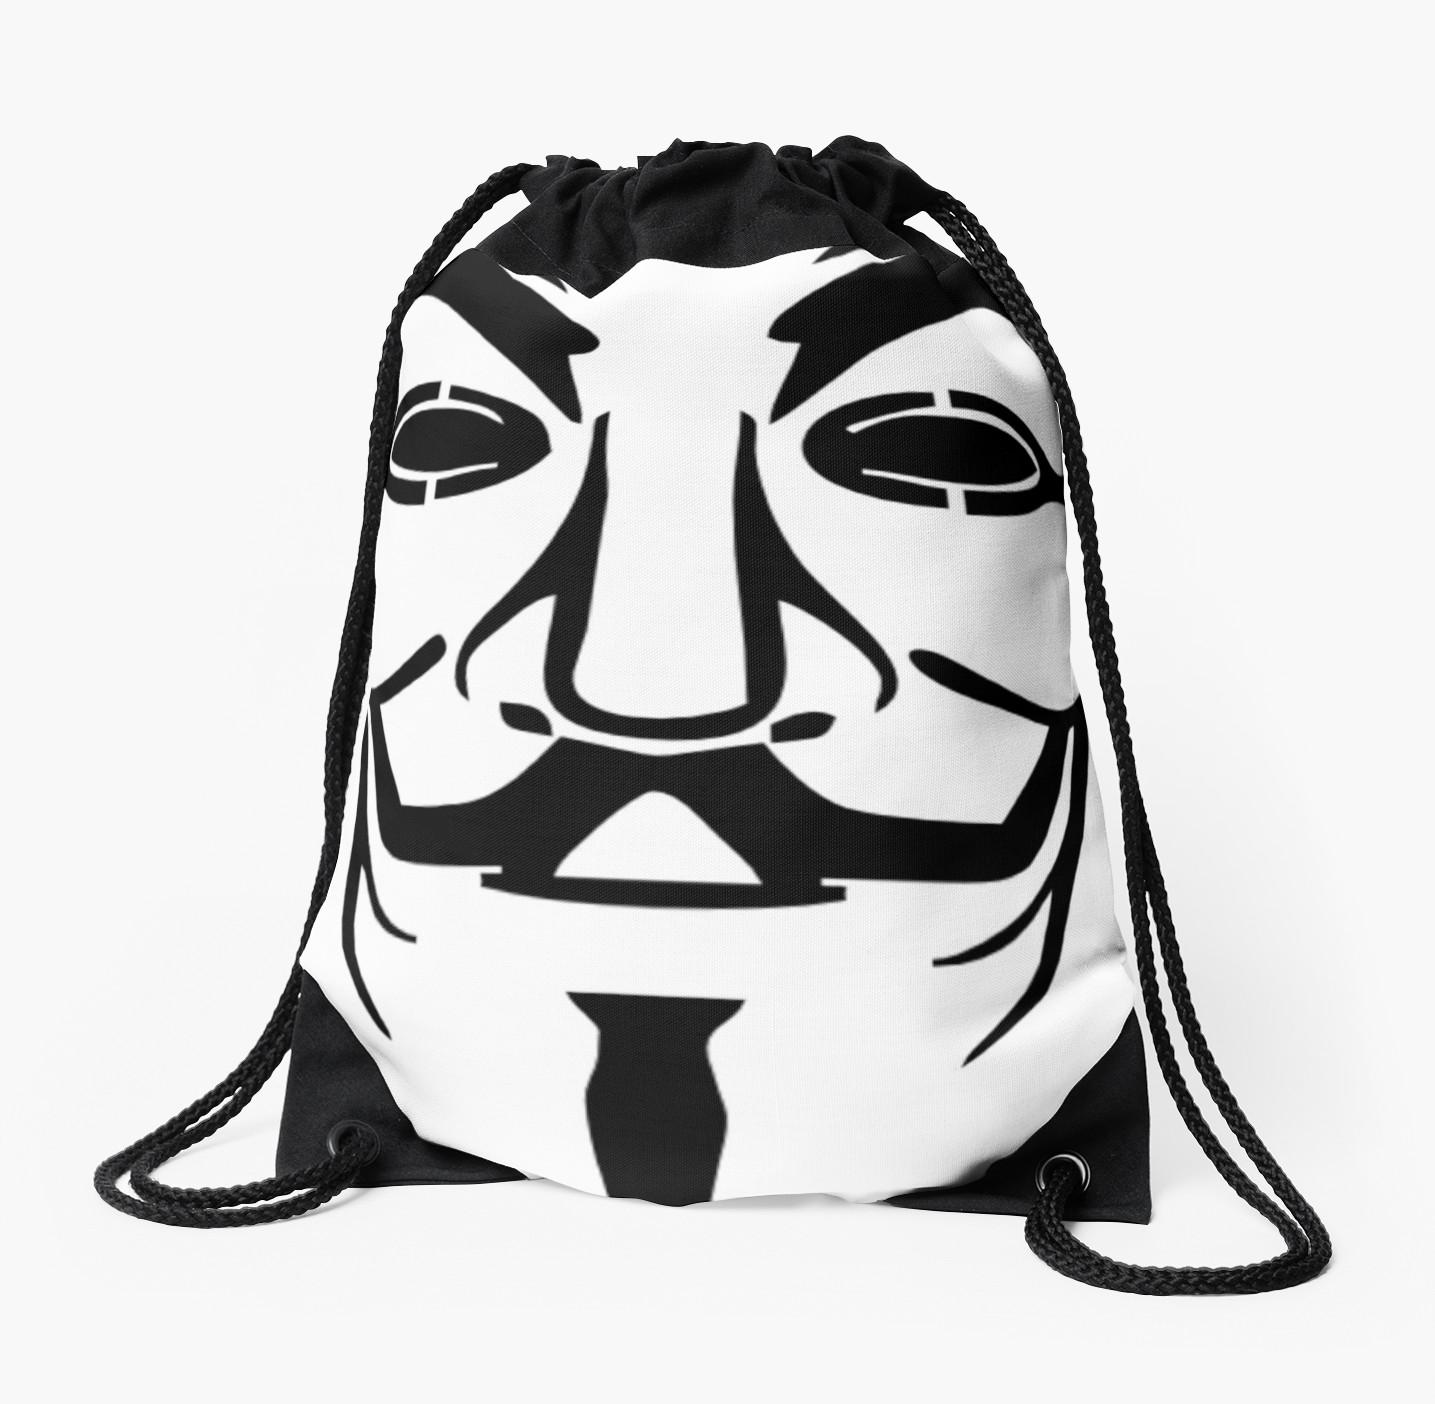 1435x1404 Anonymous Mask Silhouette Drawstring Bags By Ravanna Lotus